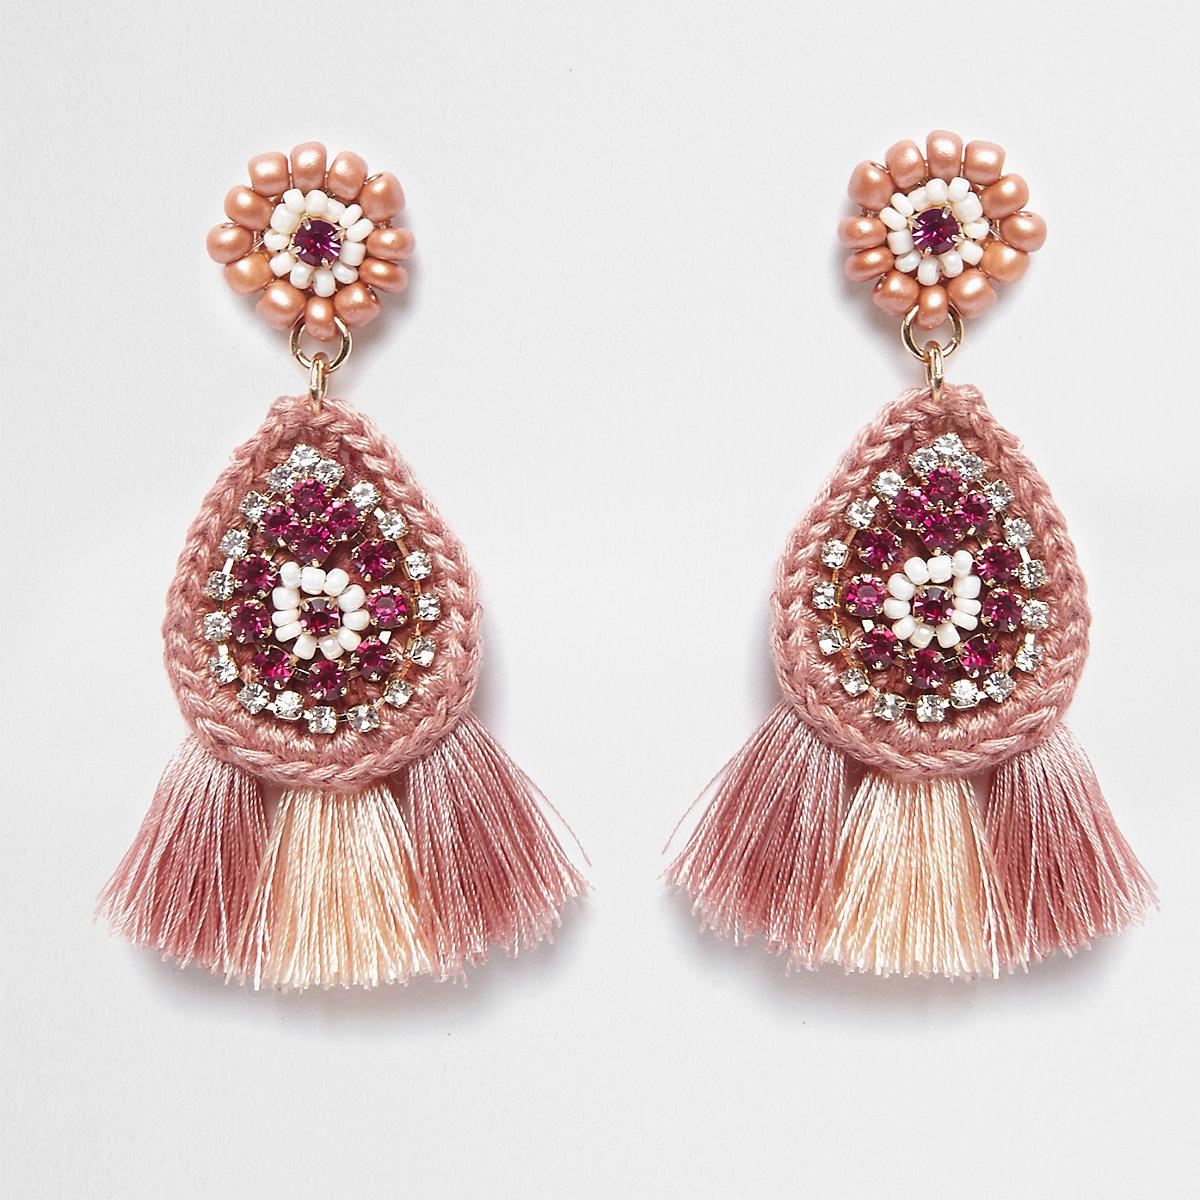 Pink beaded tassel drop earrings